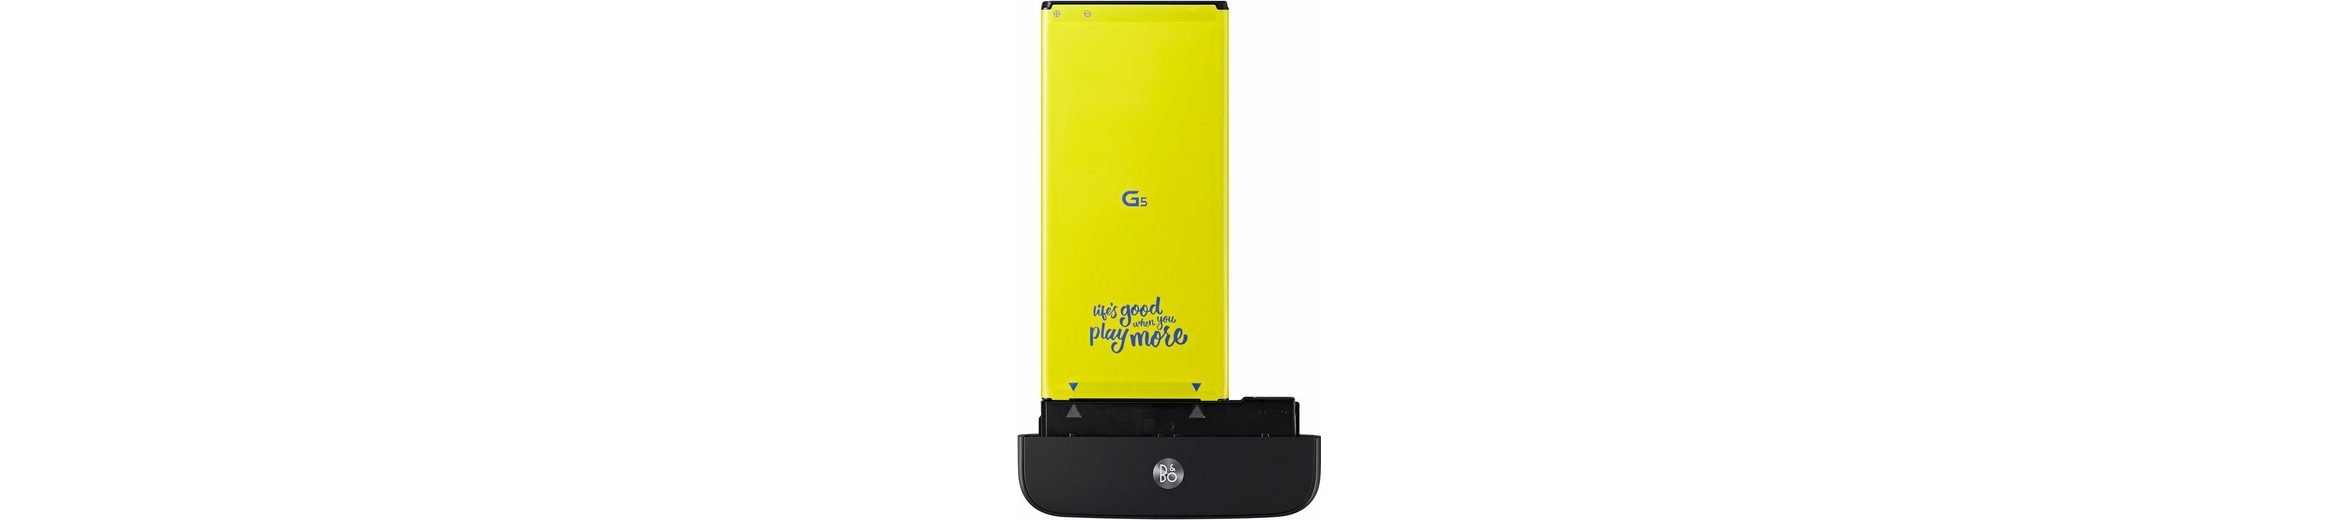 LG Hi-Fi Plus, Display